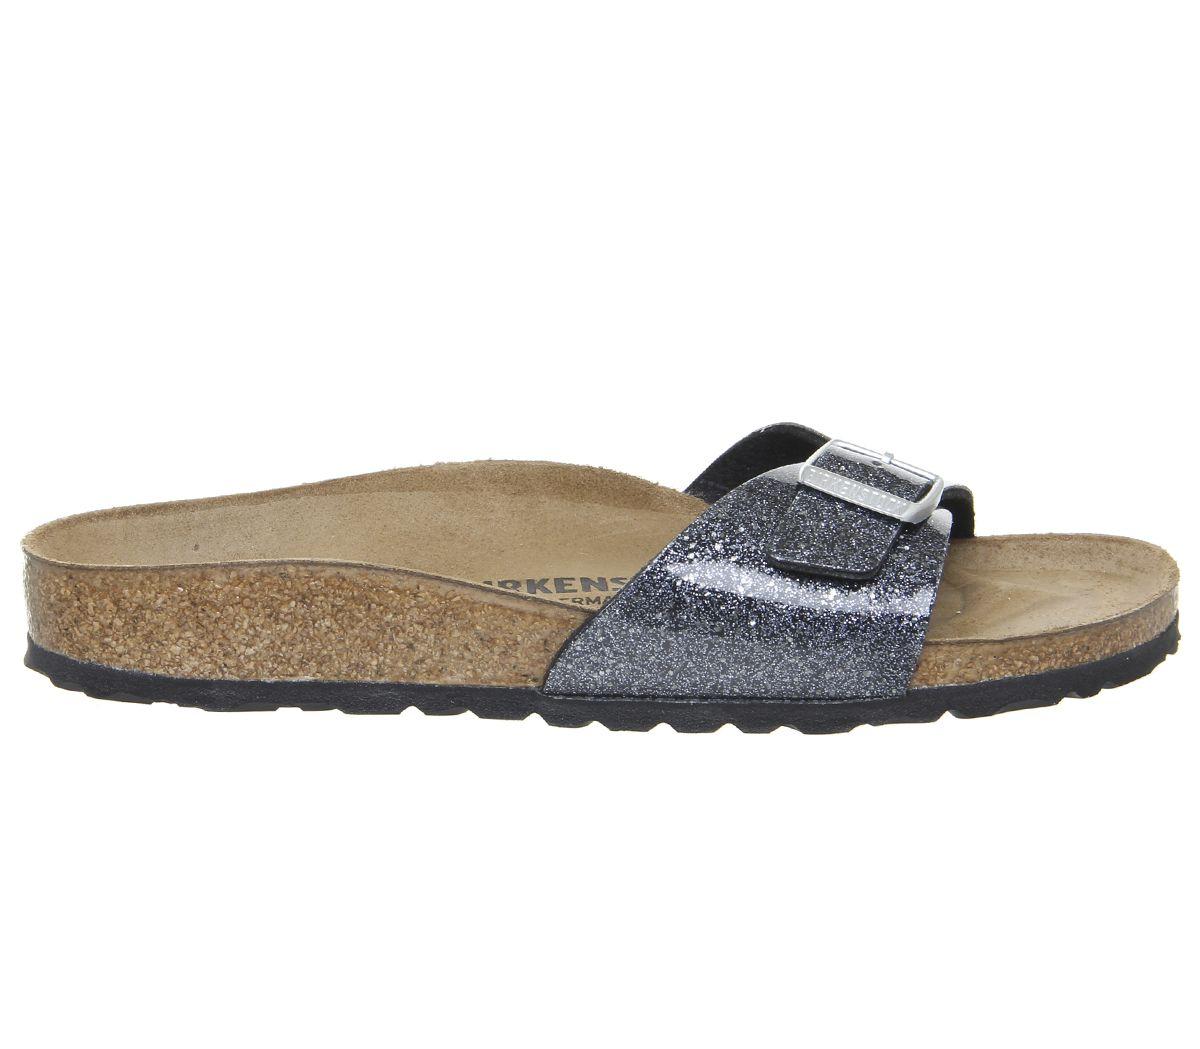 Birkenstock Madrid BF W sandal cosmic sparkle anthracite